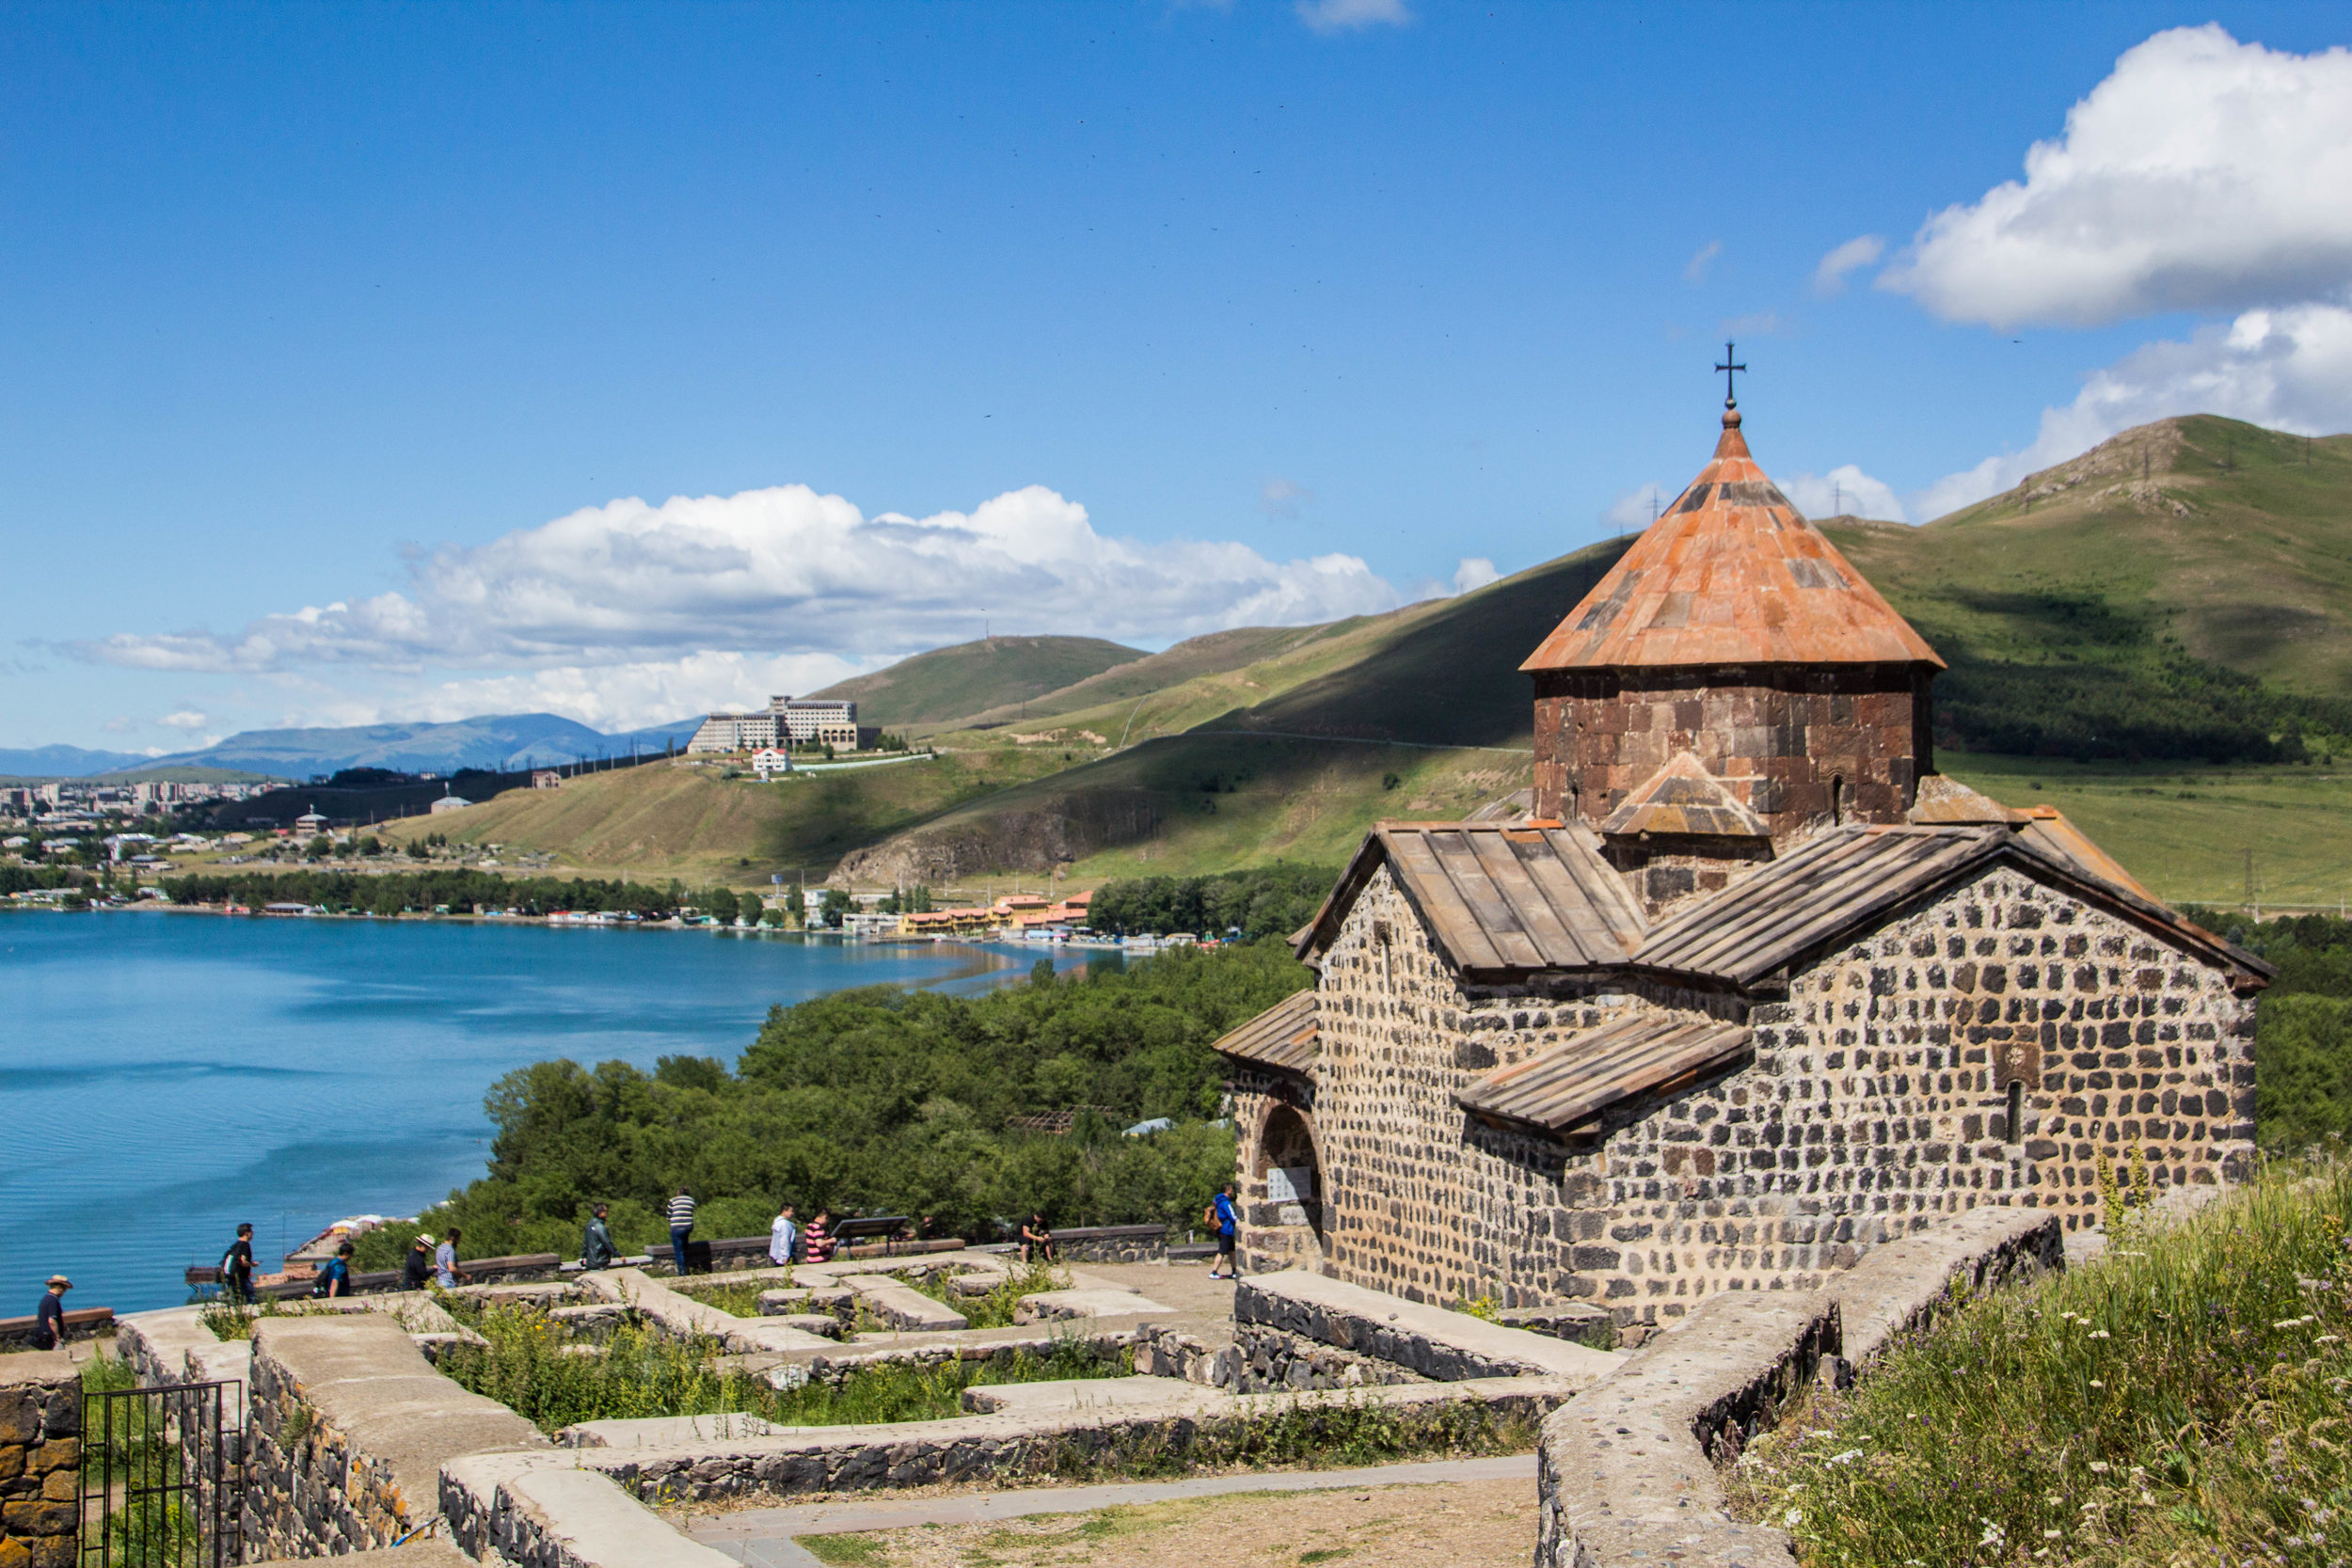 sevanavank-lake-sevan-armenia-17.jpg